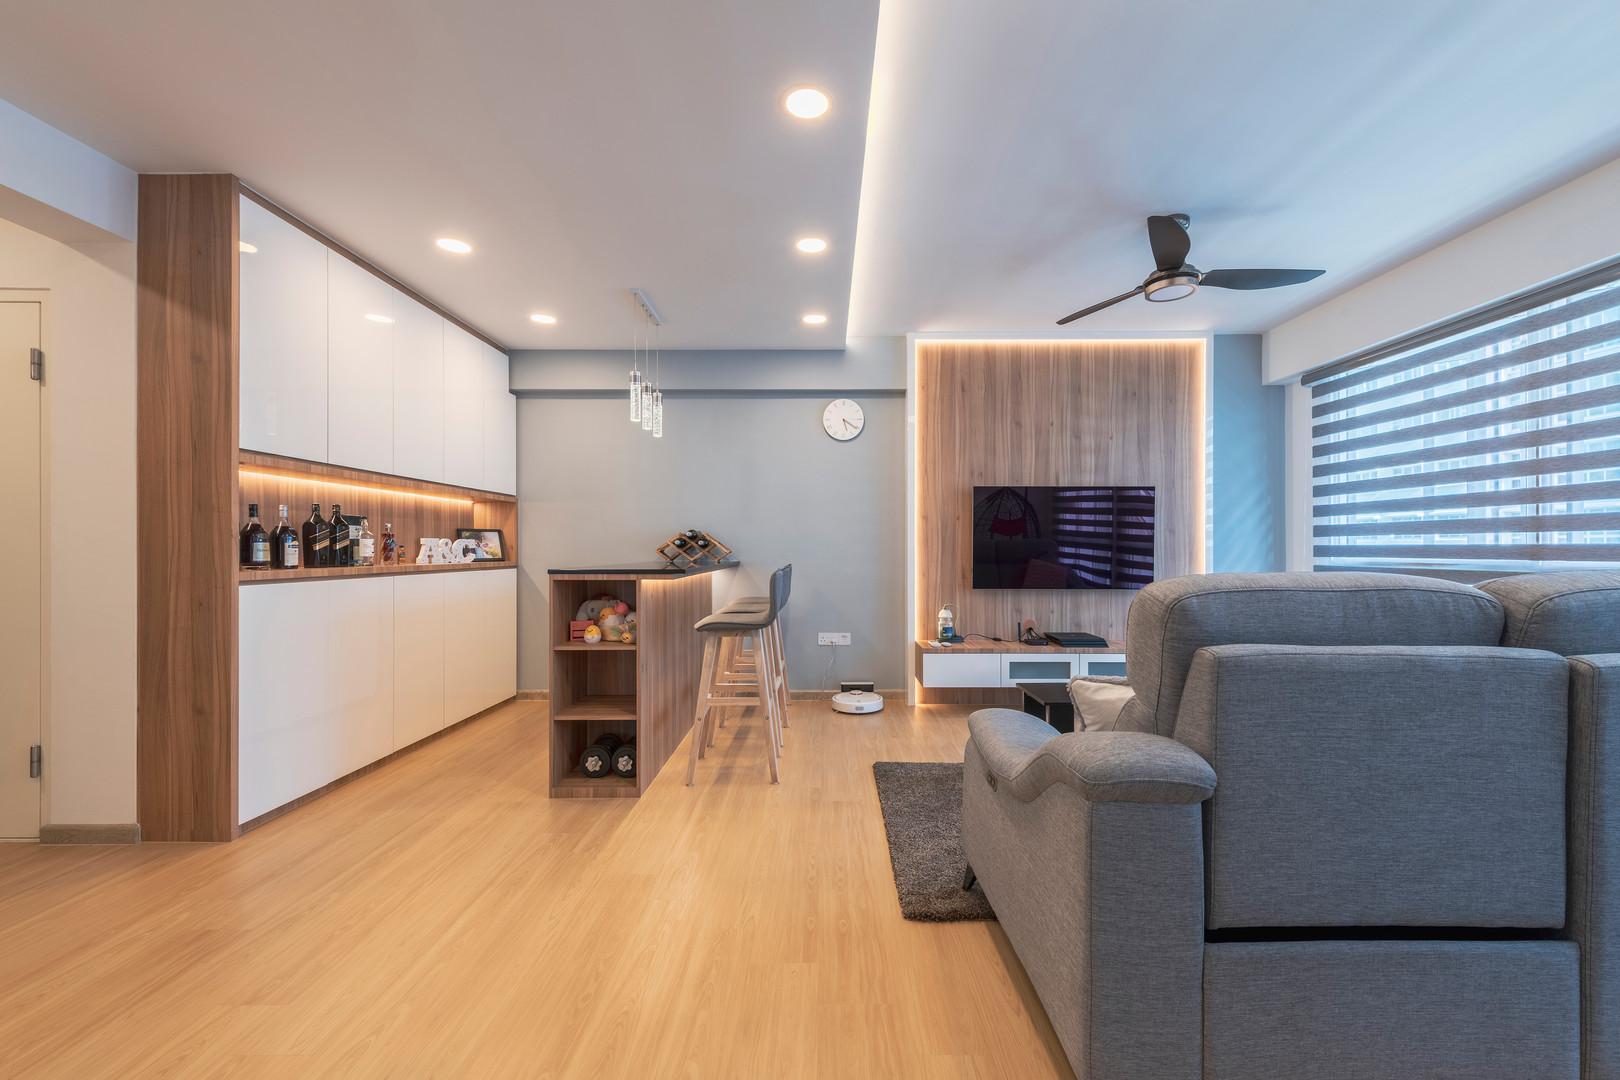 Whole living hall